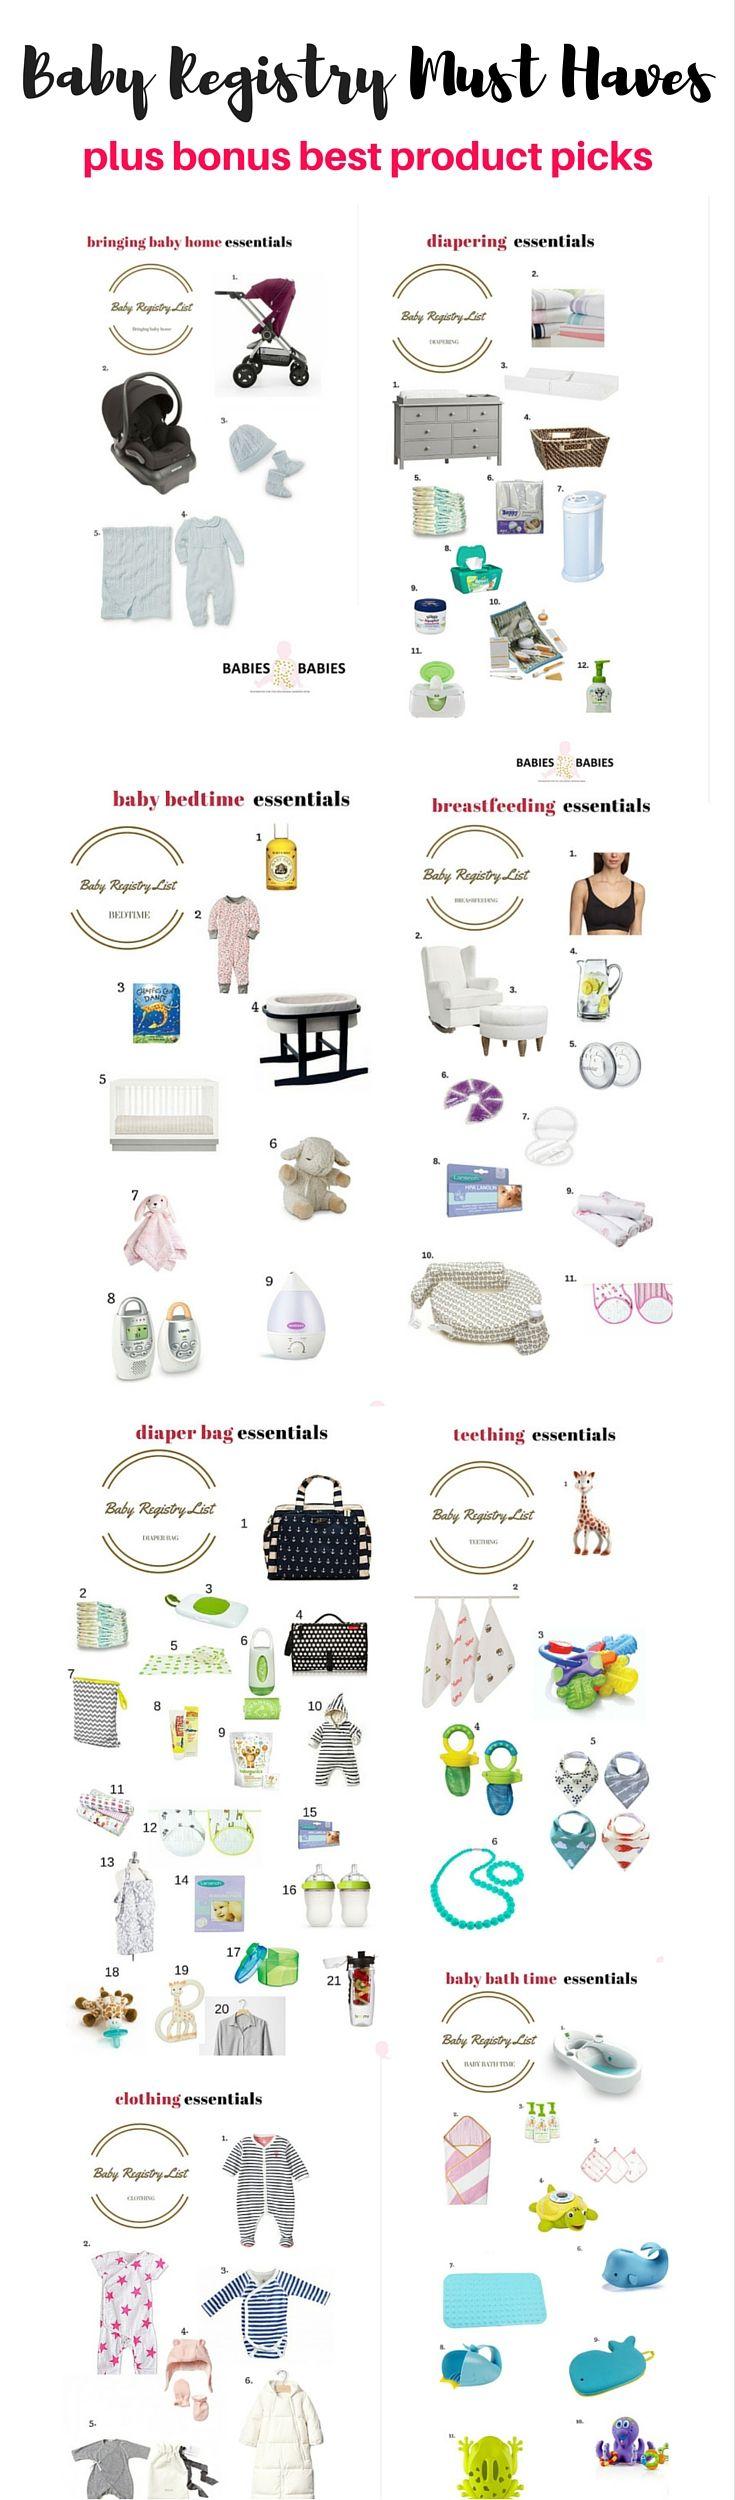 Baby Registry List | Baby registry checklist, Baby registry and Parents